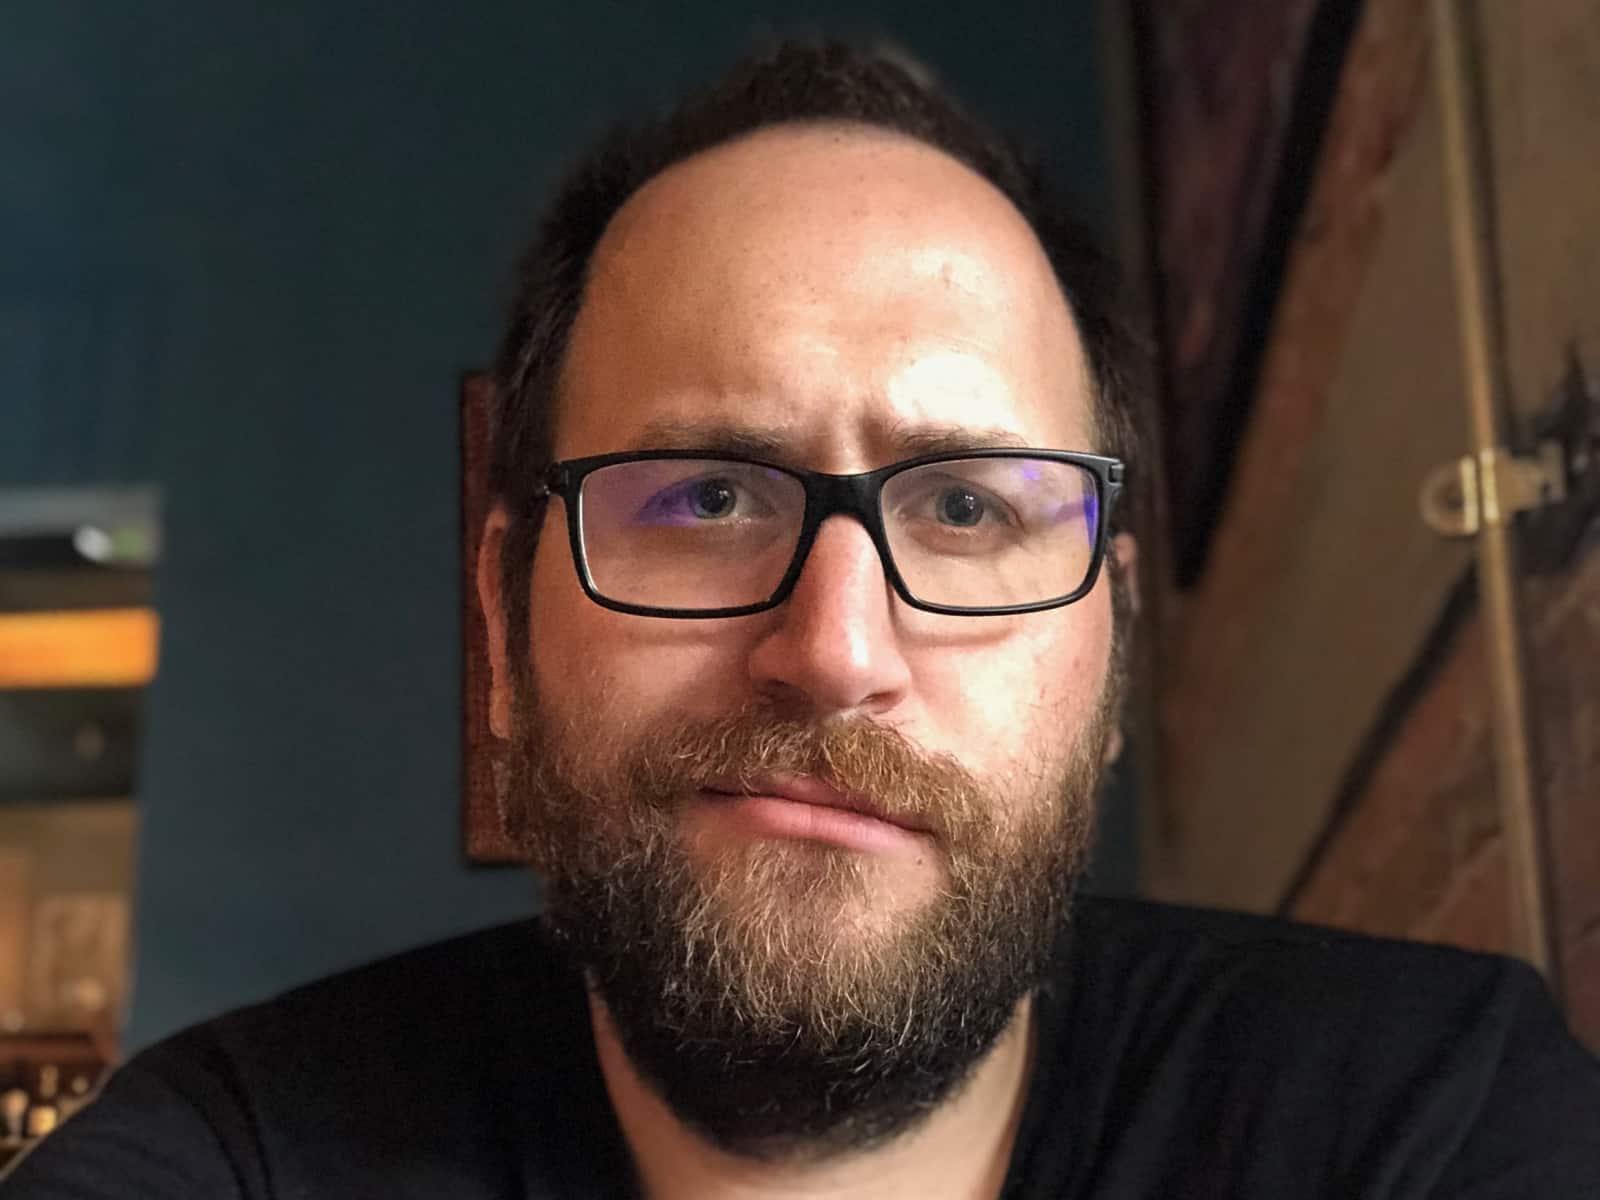 Joseph from Halifax, Nova Scotia, Canada